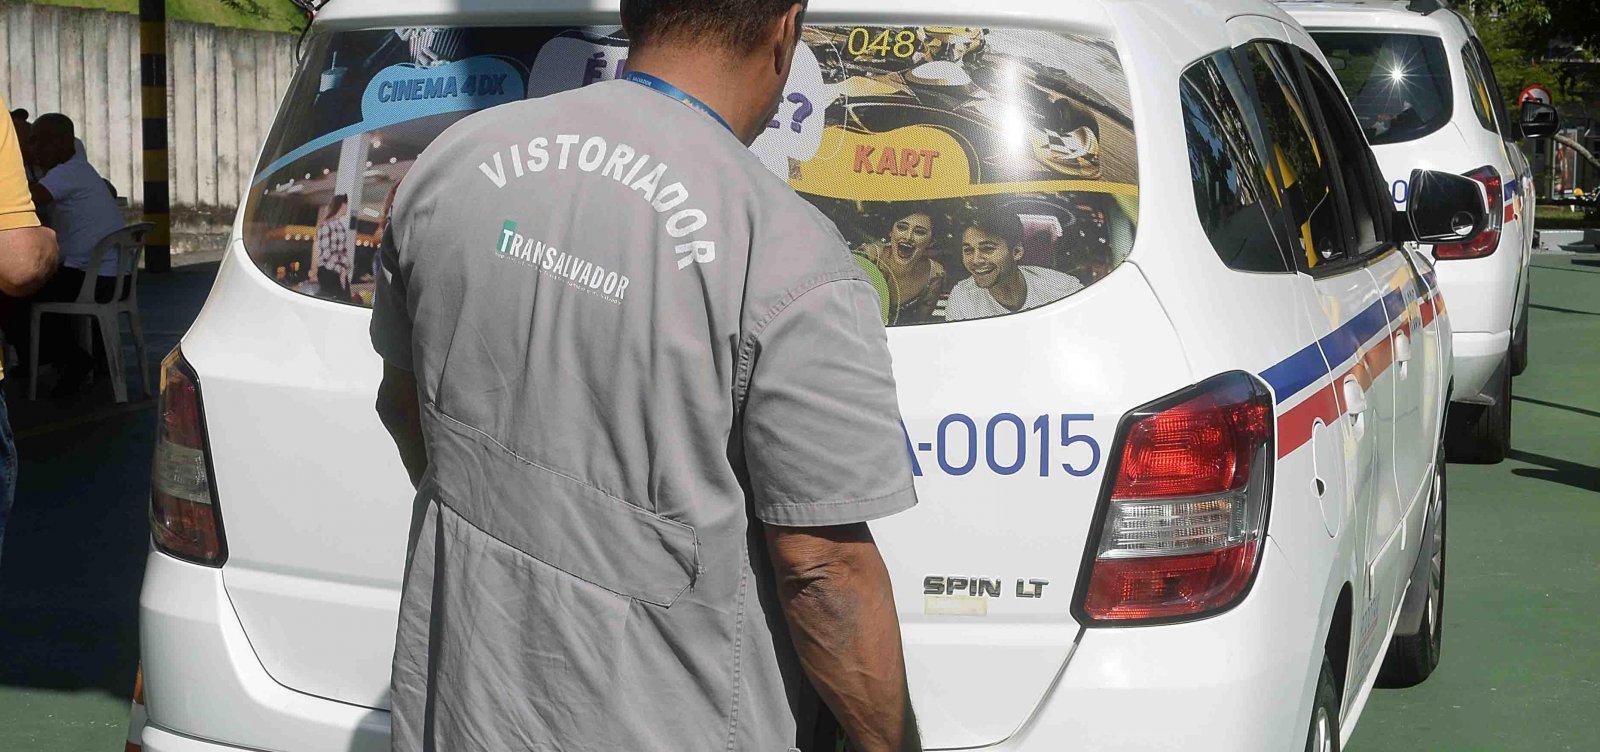 Secretaria de Mobilidade inicia vistoria de táxis nesta segunda-feira